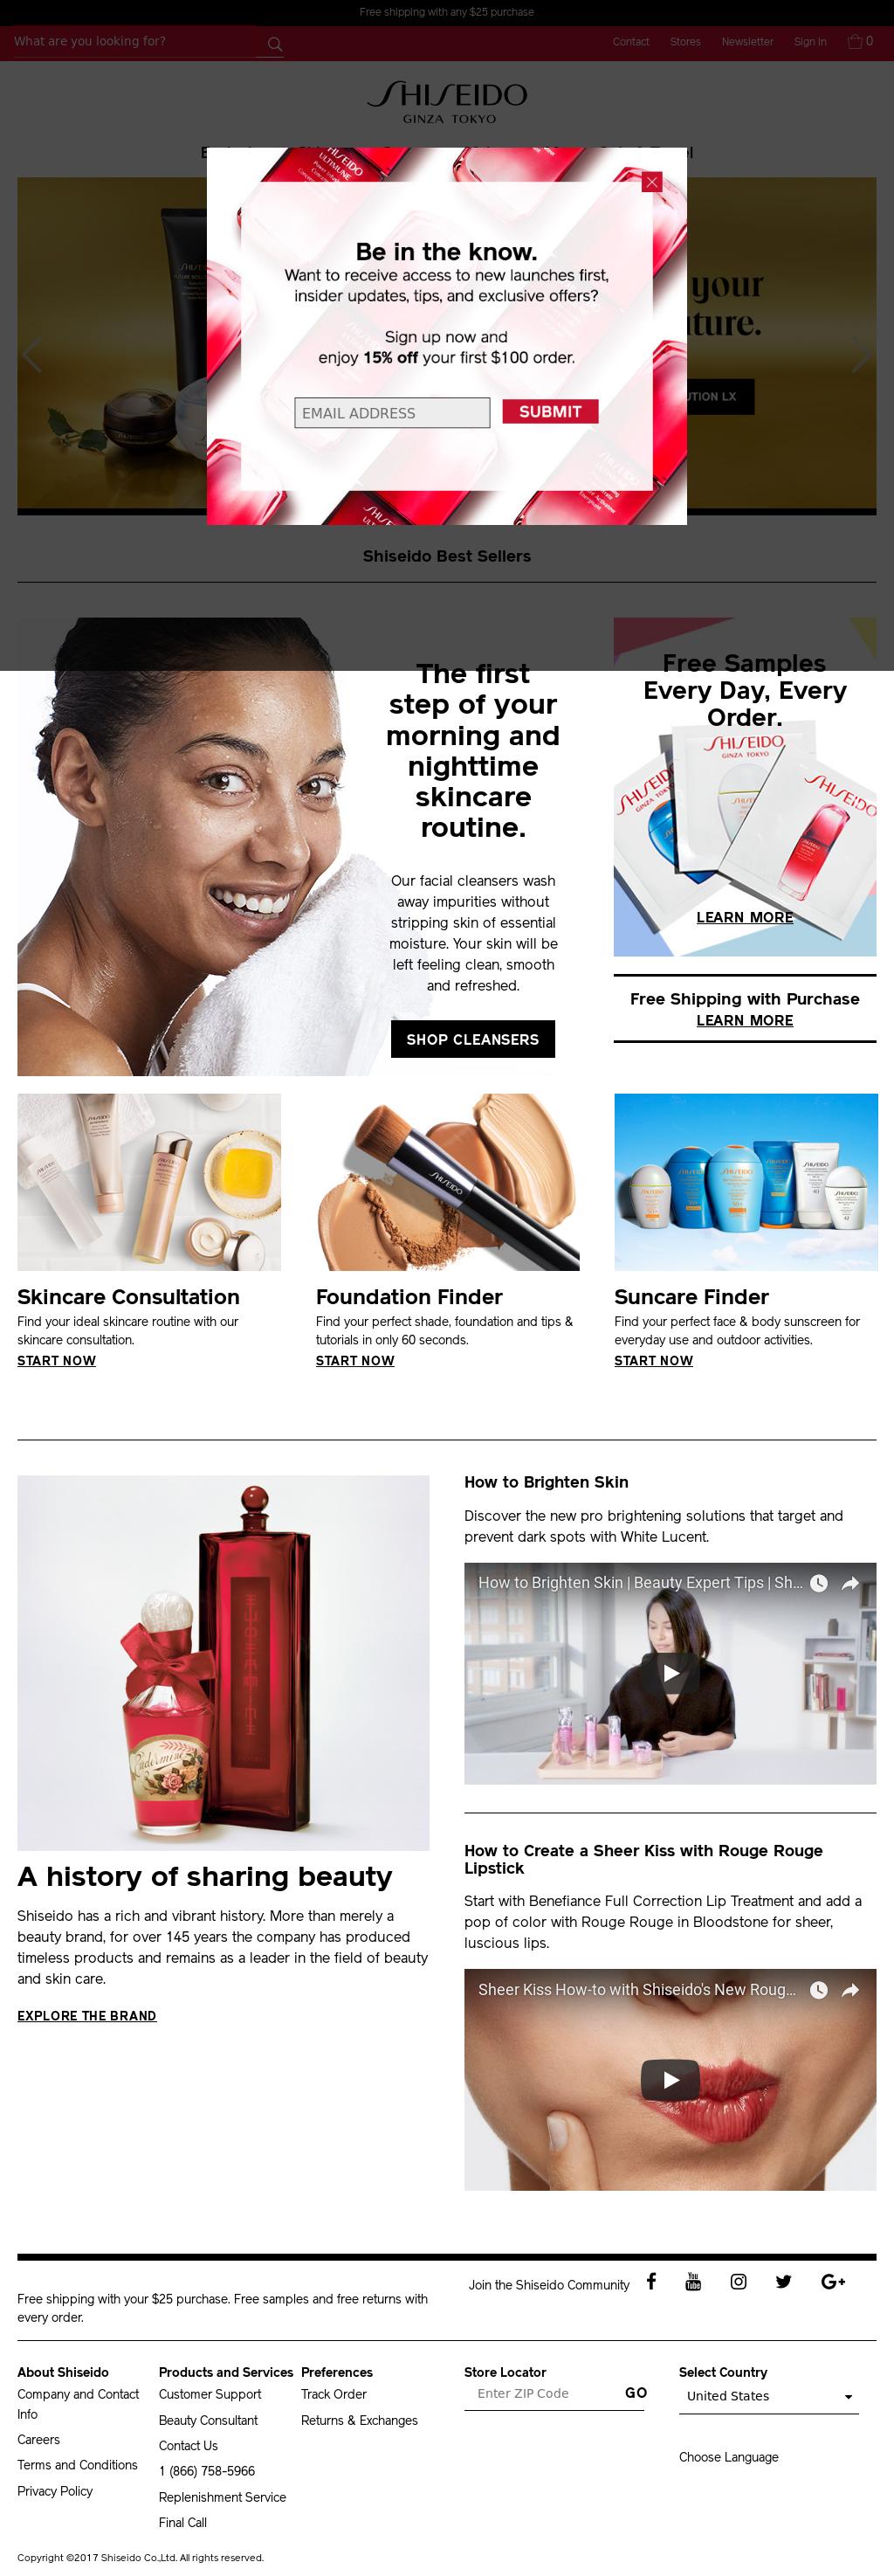 Shiseido Competitors, Revenue and Employees - Owler Company